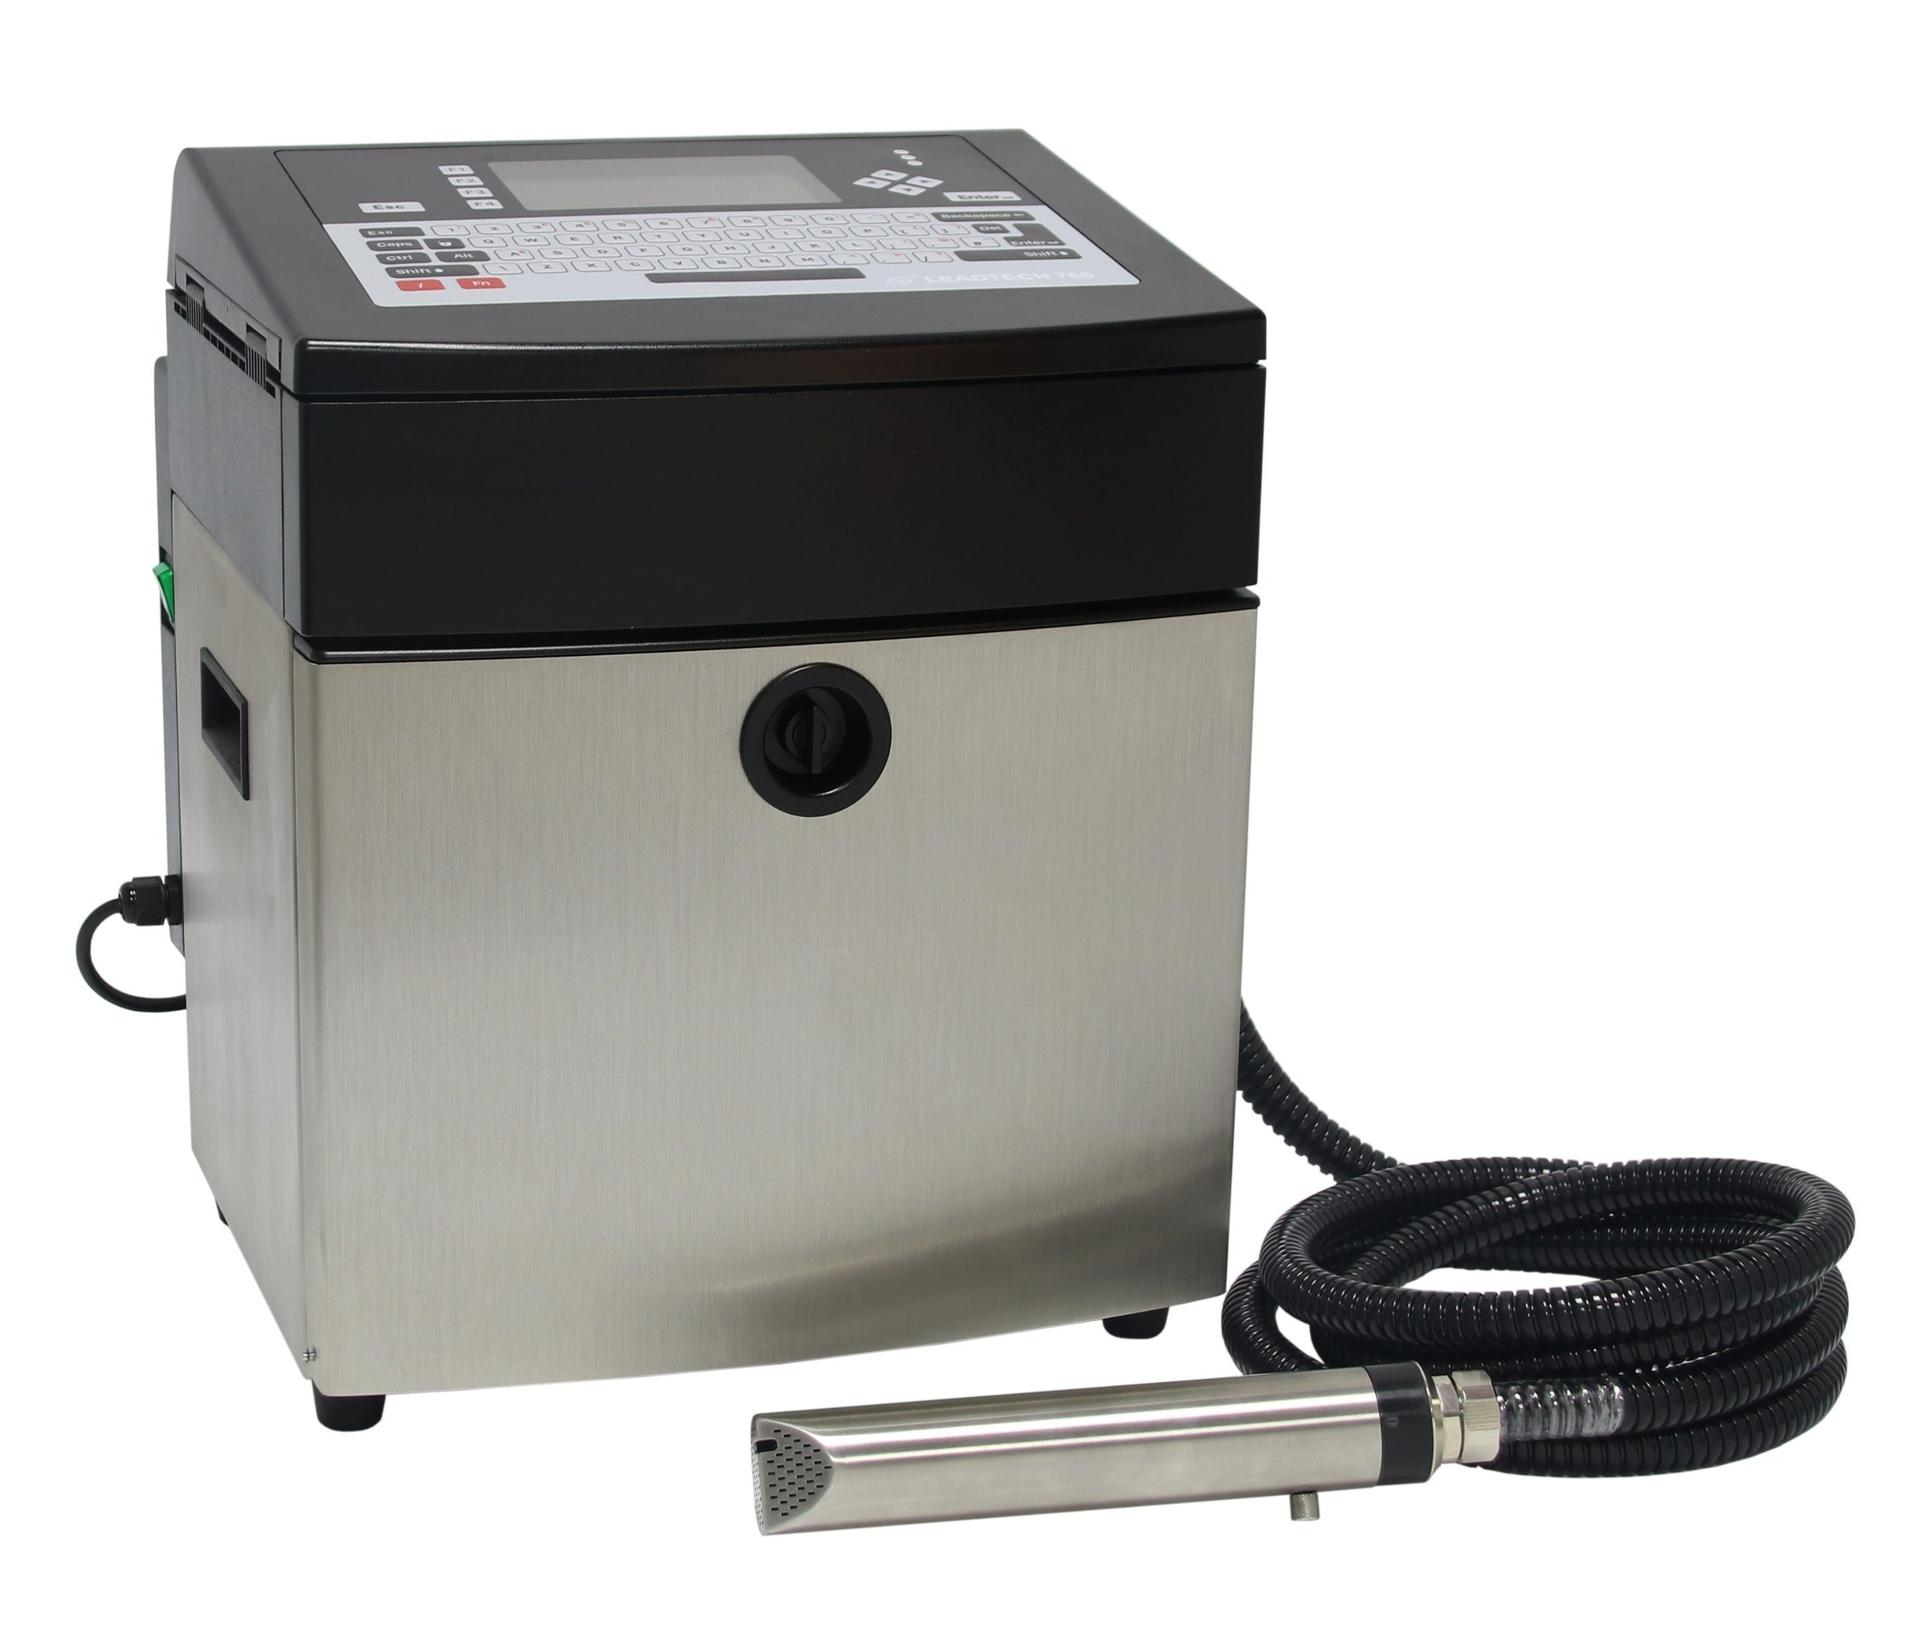 Lead Tech Lt760 Black to Red Coding Cij Inkjet Printer